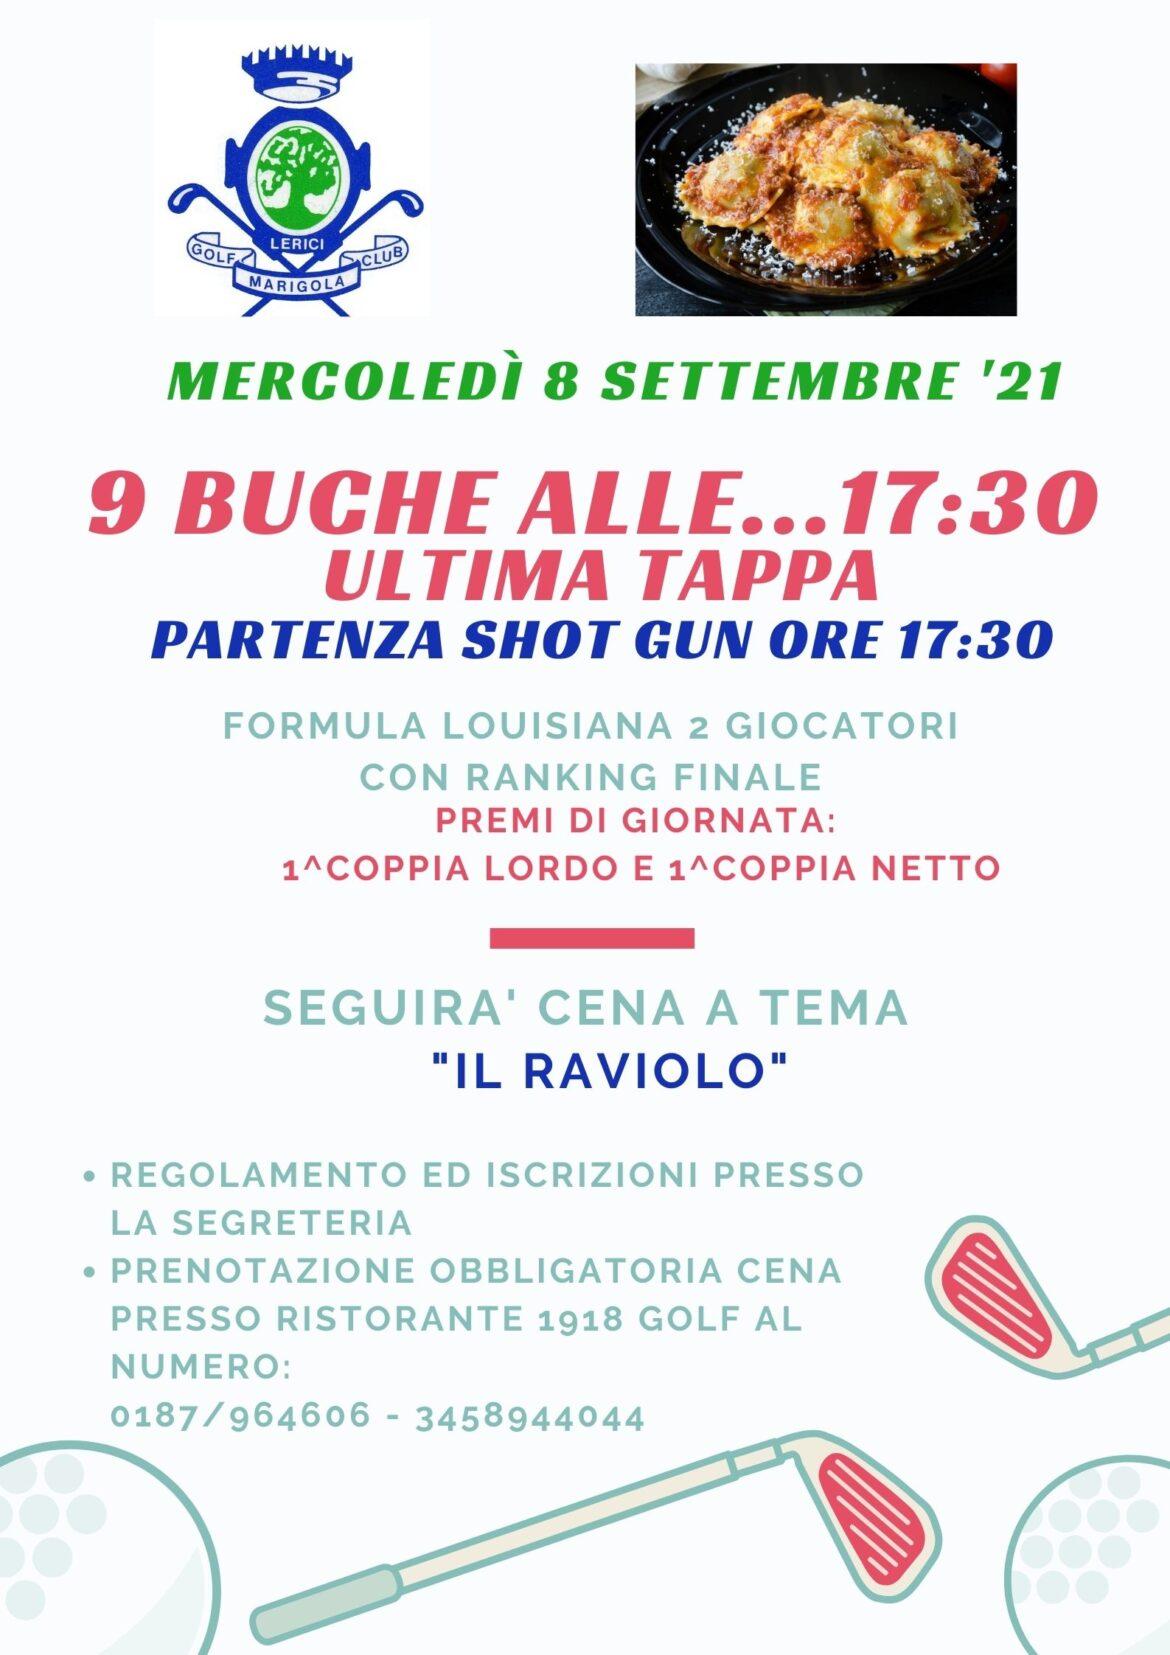 9 BUCHE ALLE…17:30 – SHOT GUN 8 settembre 2021